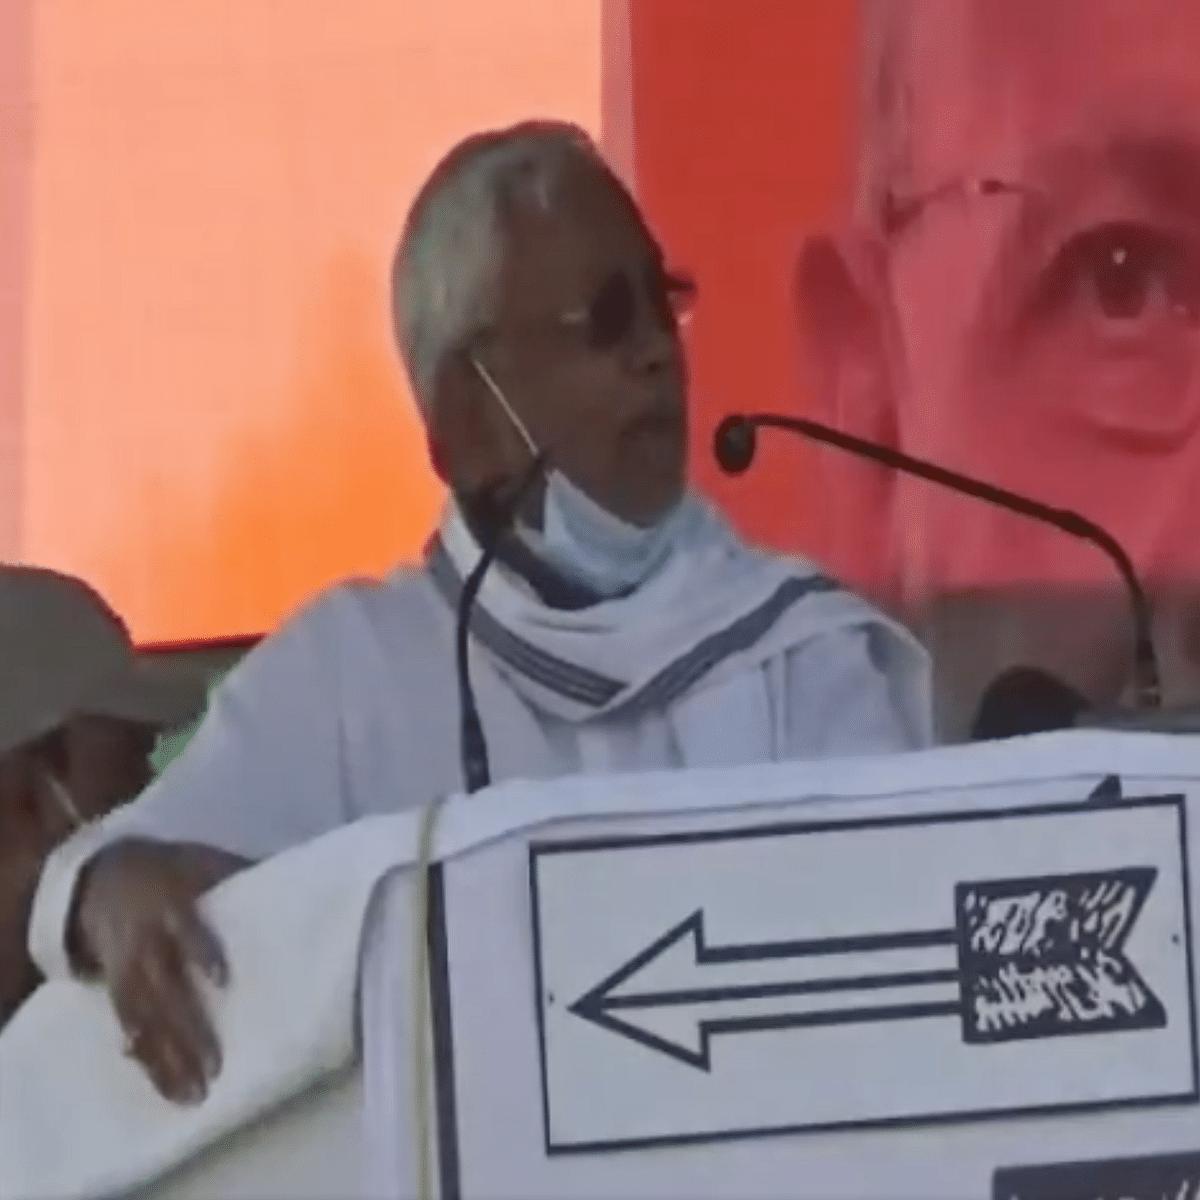 WATCH: 'Nitish Kumar is a thief, has eaten MNREGA money,' slogans raised at Bihar CM's rally